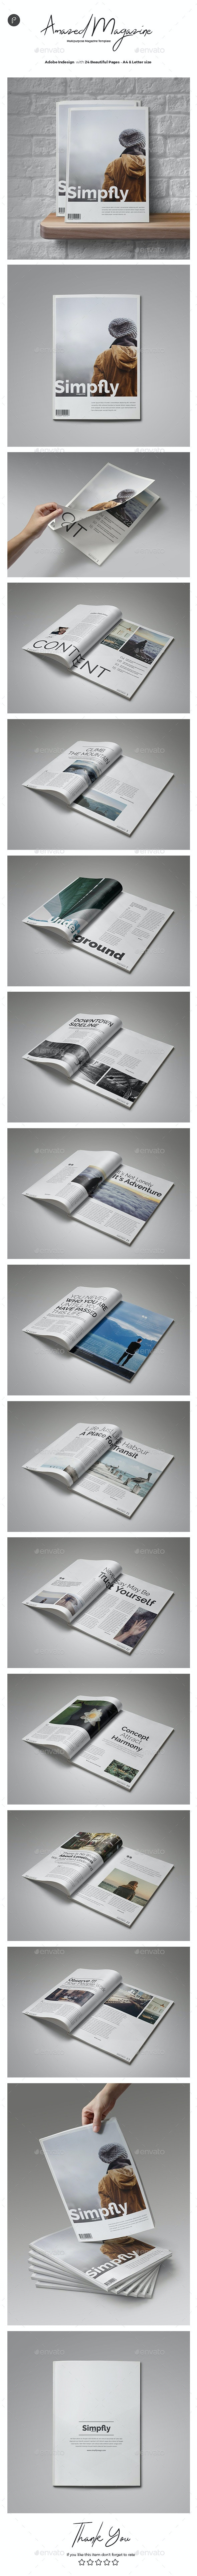 Clean & Simple Magazine Vol.2 - Magazines Print Templates